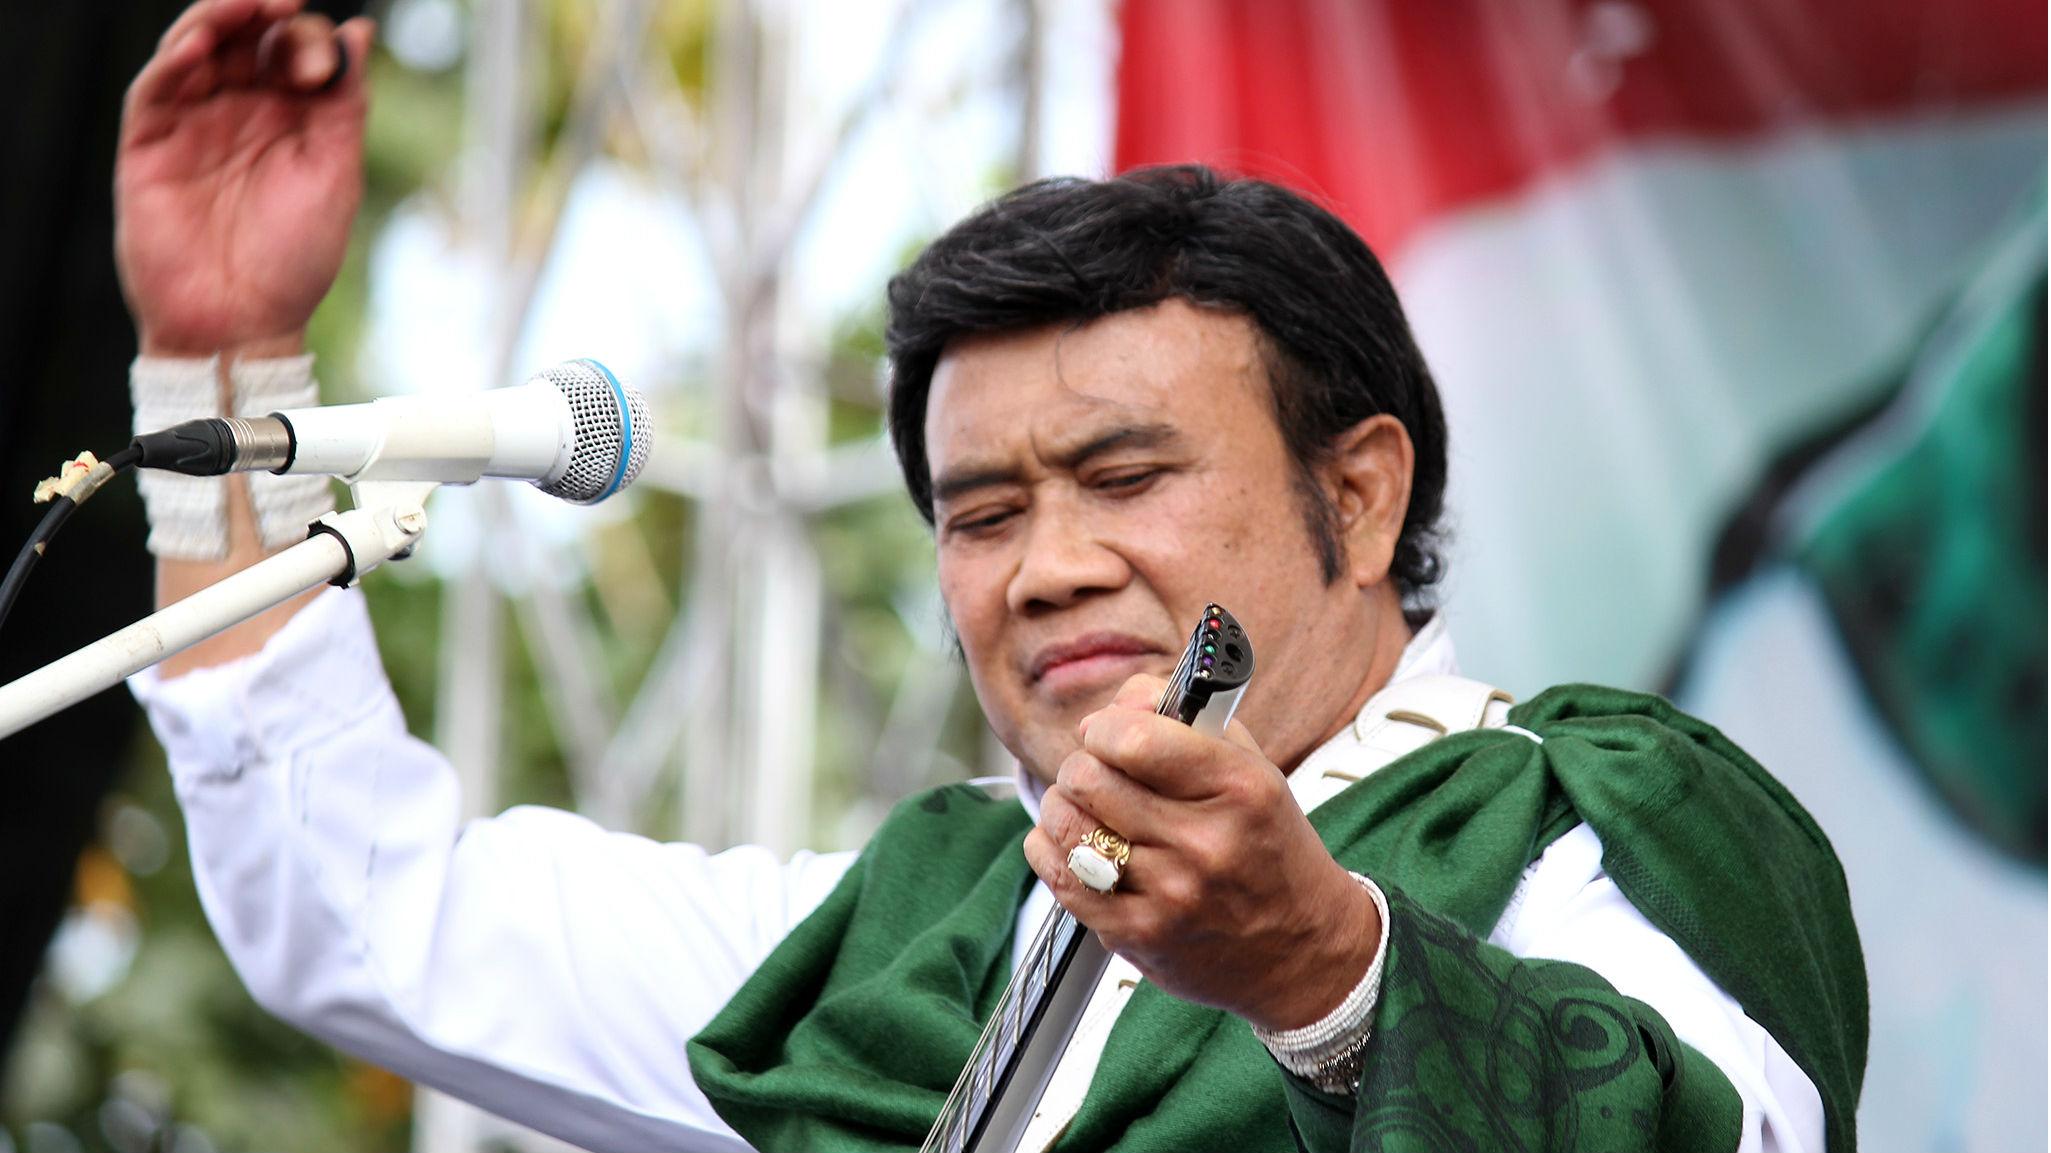 Partai Idaman Inhil Targetkan Satu Fraksi Pada Pileg 2019